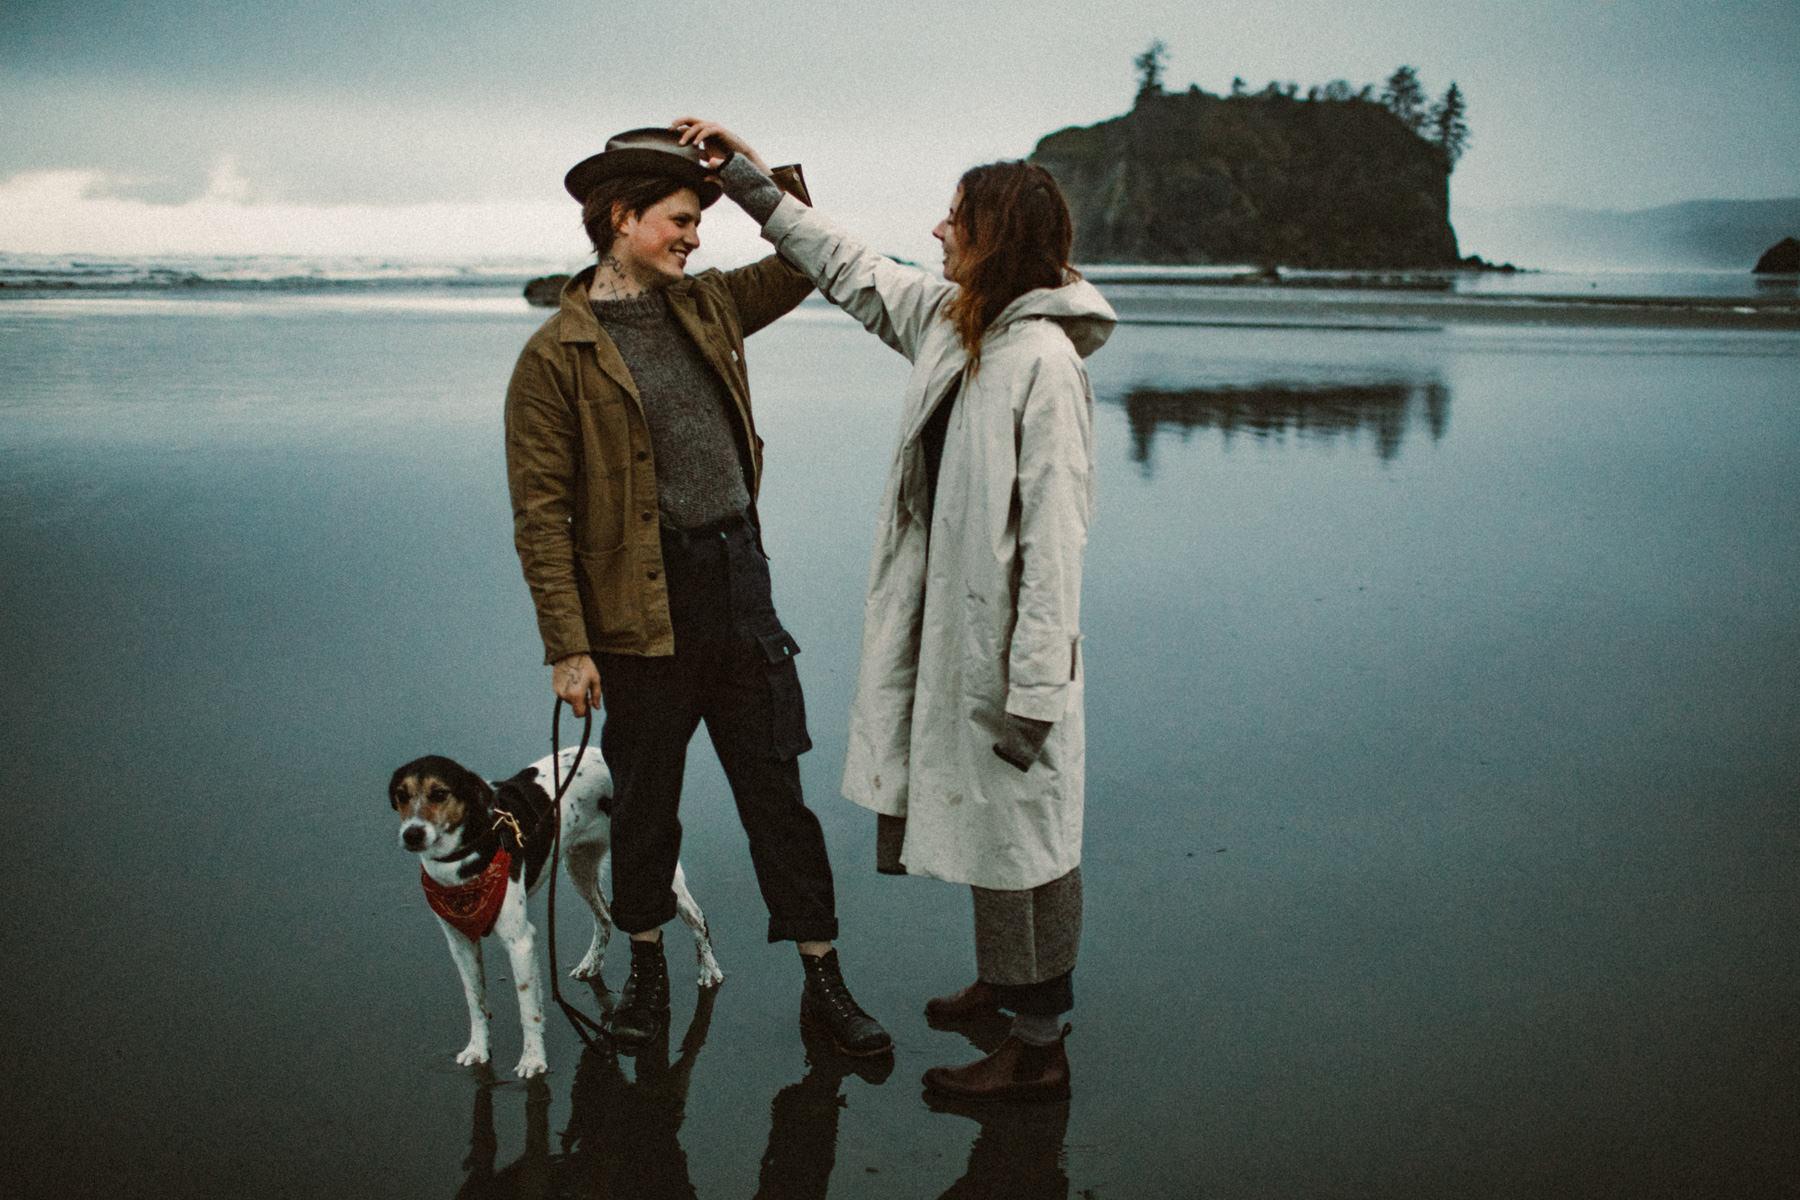 ruby-beach-1924us-engagement-photos-13.jpg